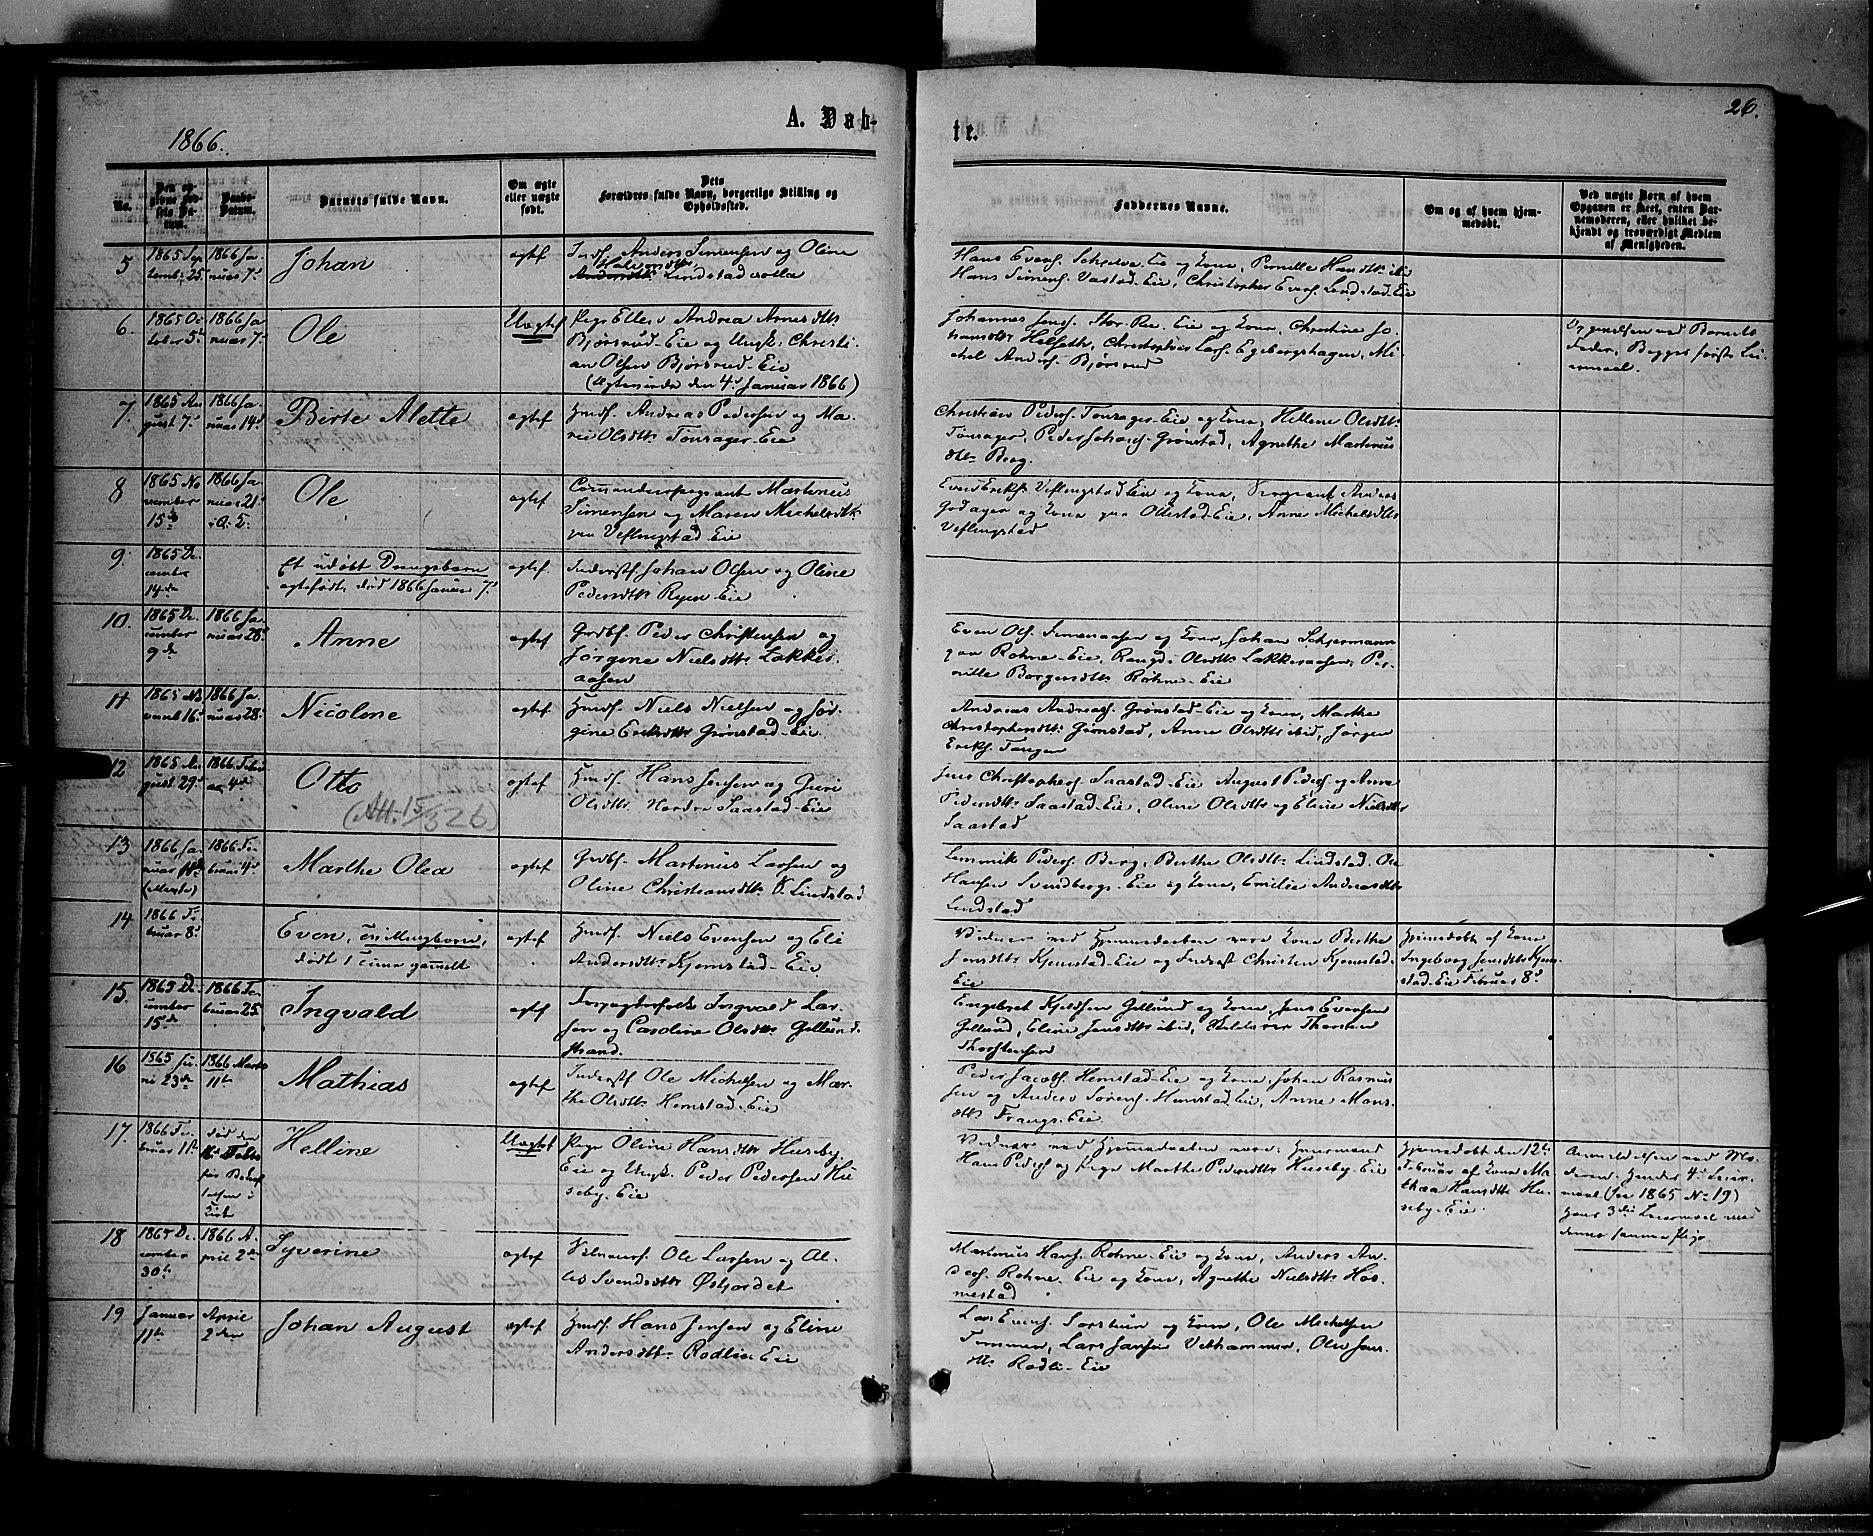 SAH, Stange prestekontor, K/L0013: Ministerialbok nr. 13, 1862-1879, s. 26